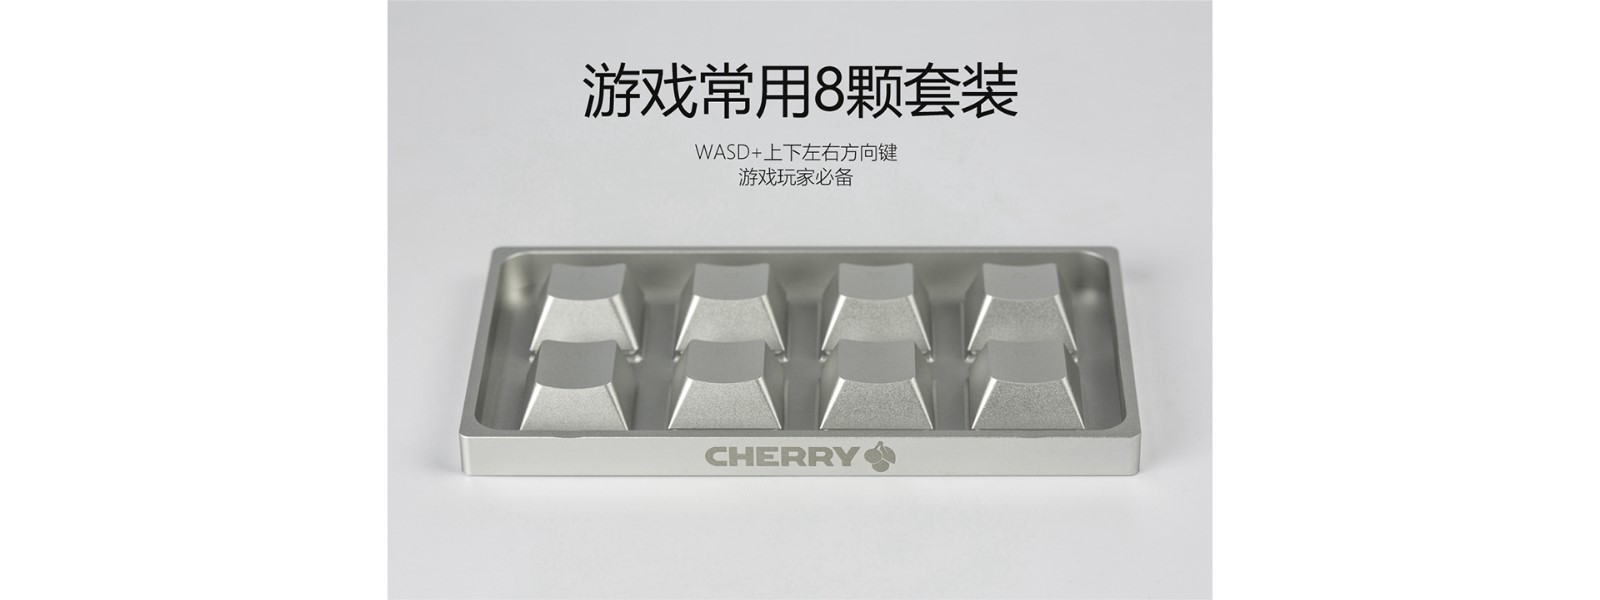 CHERRY KA026金属键帽详情页2.jpg